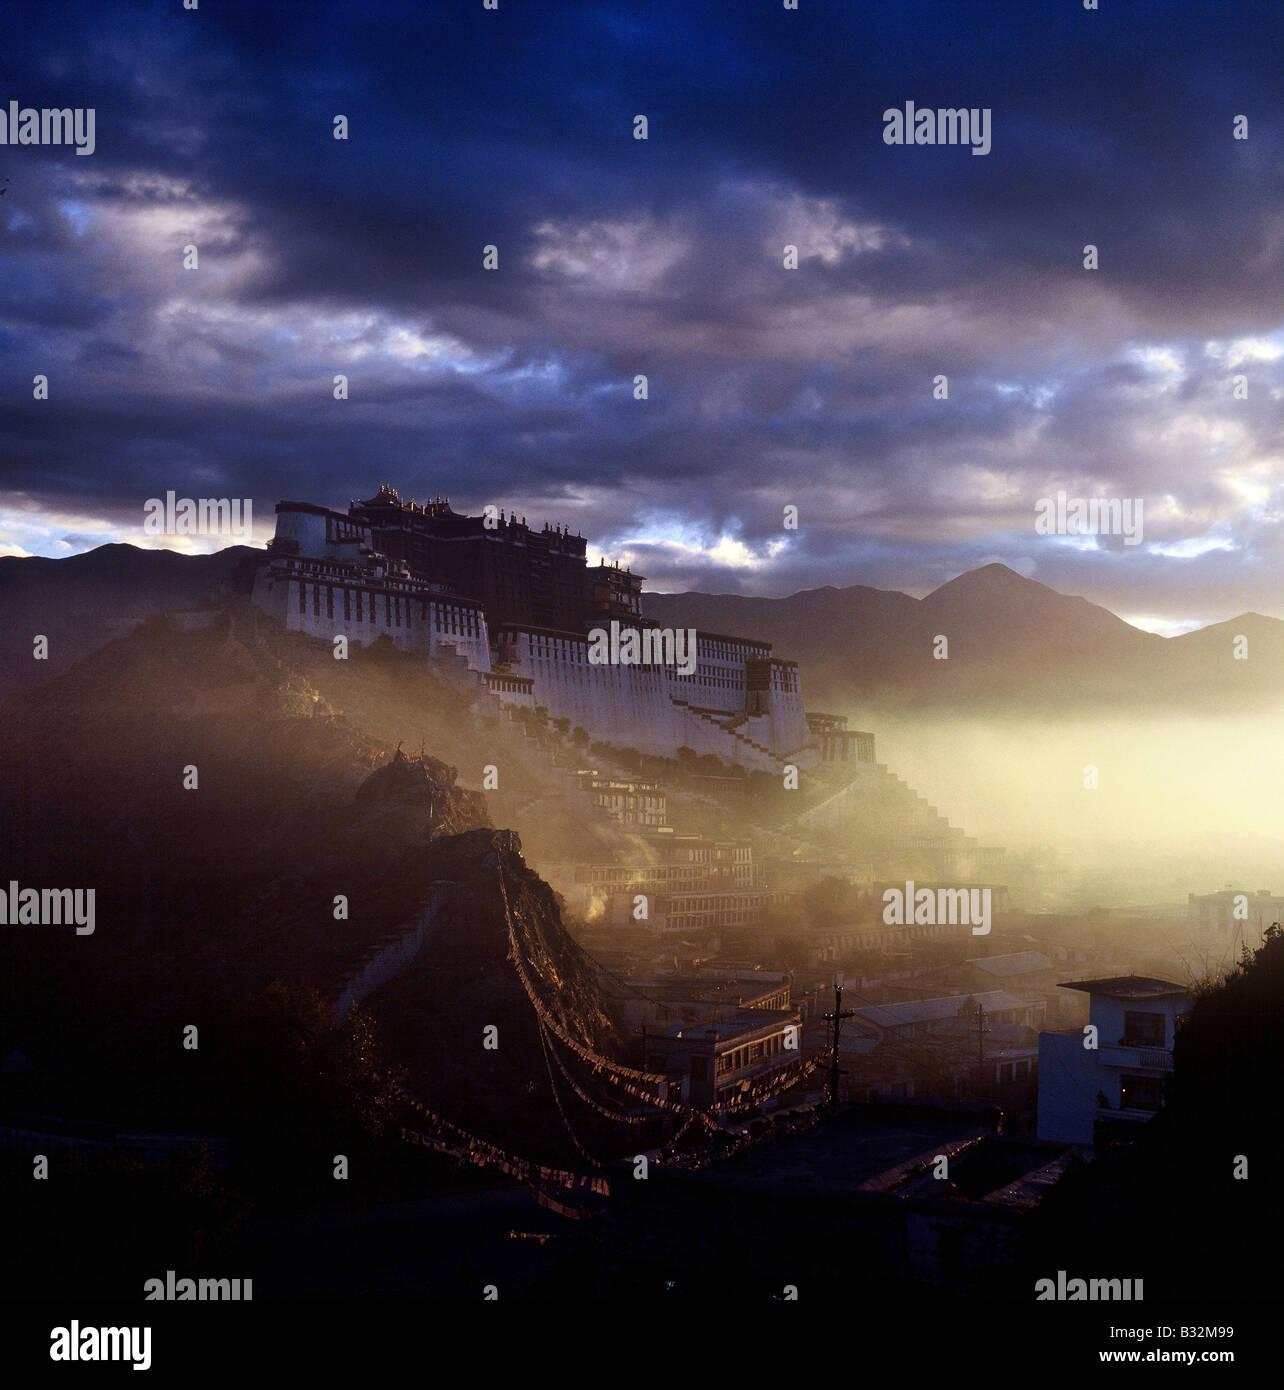 Potala Palace,Lhasa,China - Stock Image